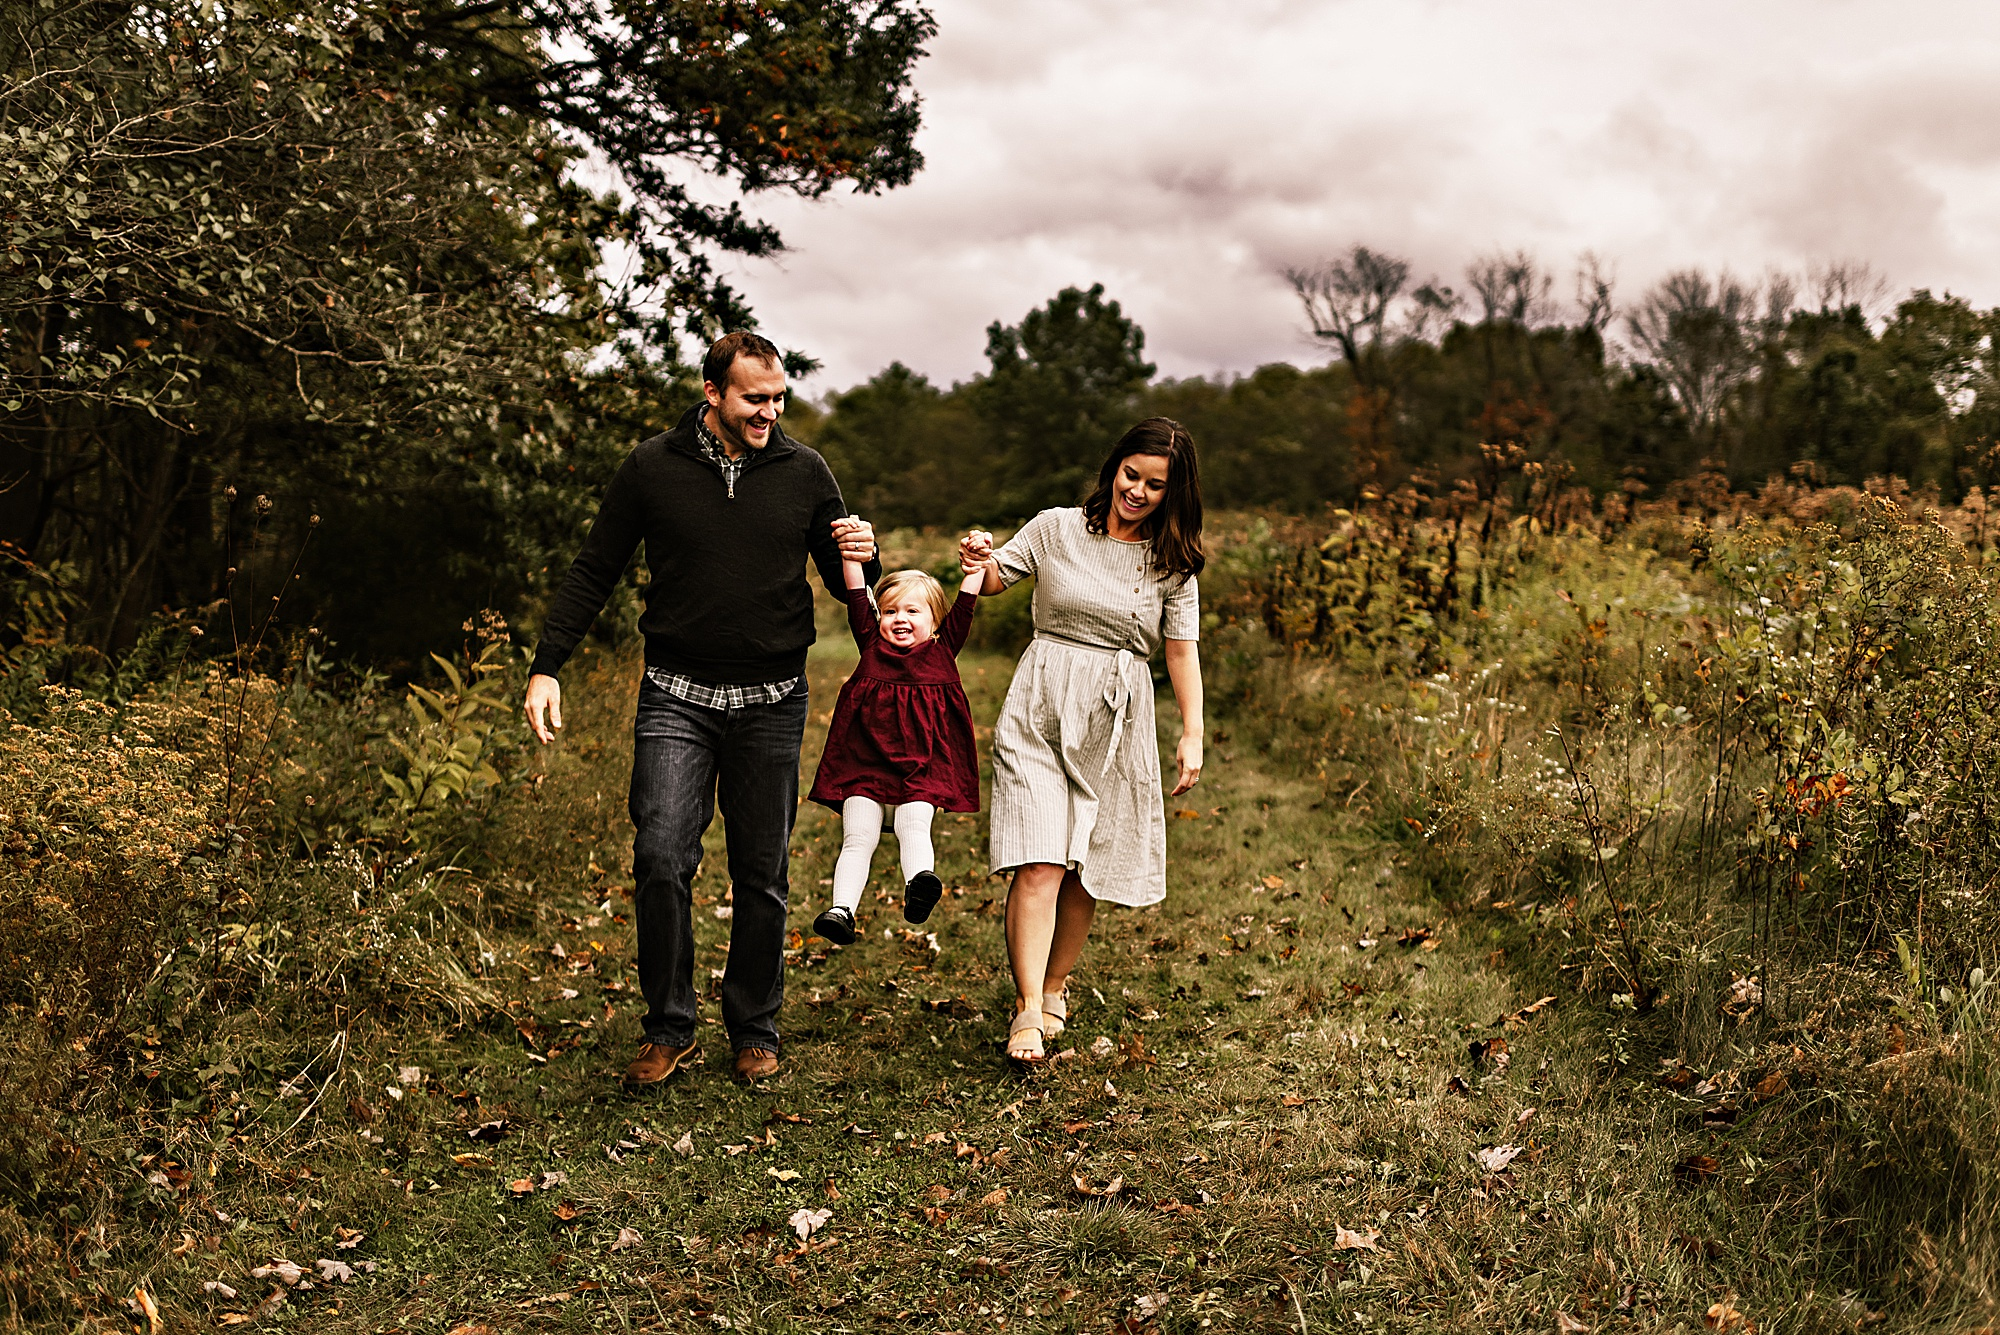 lauren-grayson-photography-akron-ohio-maternity-session-fall-hammer_0044.jpg